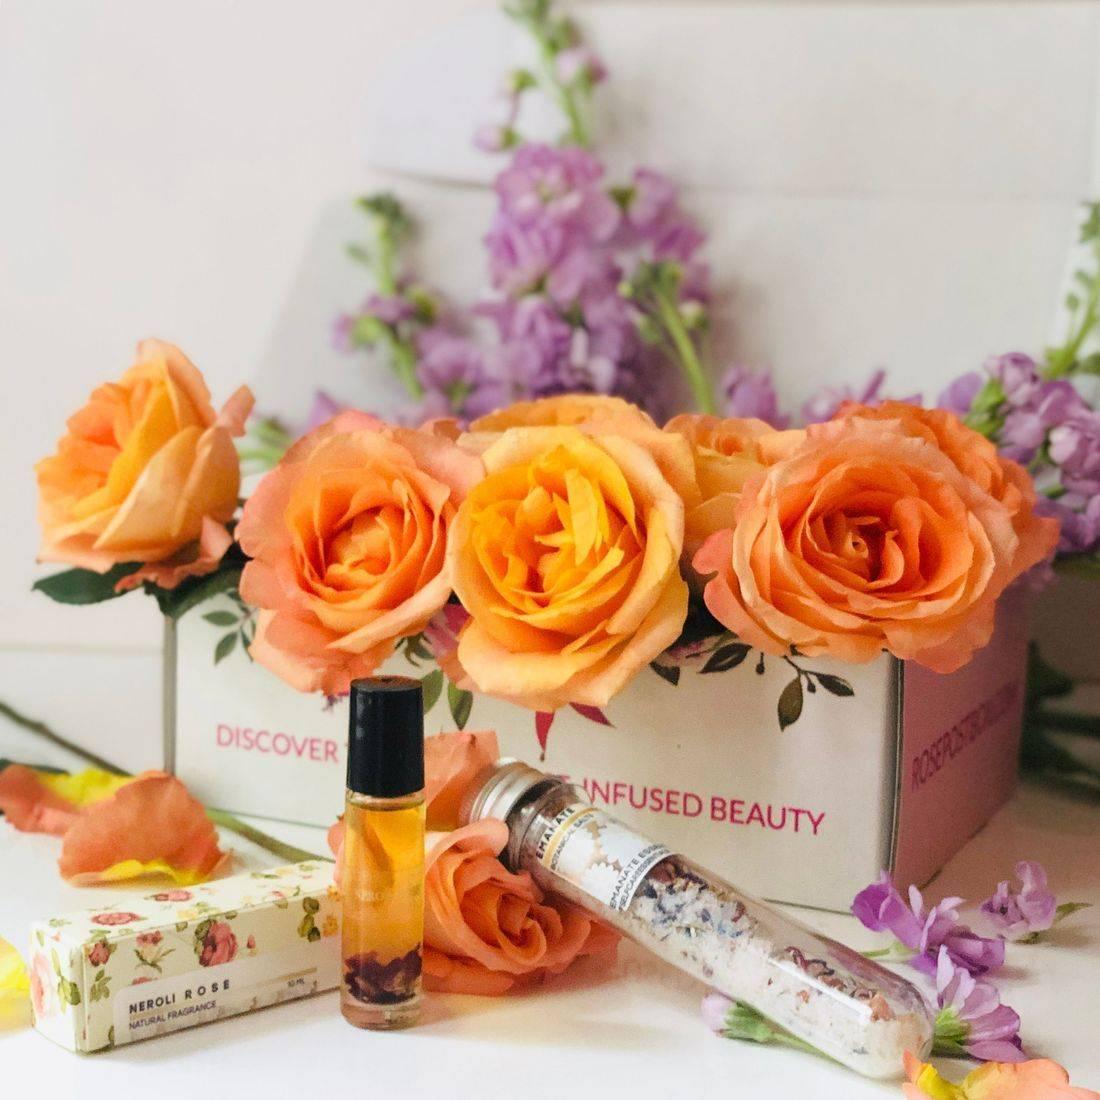 Rose Perfume, Clean Perfume, Neroli Rose Perfume, Natural Clean Rose Perfume, Clean Rose Beauty, RosePost Box, Eco Beauty Box